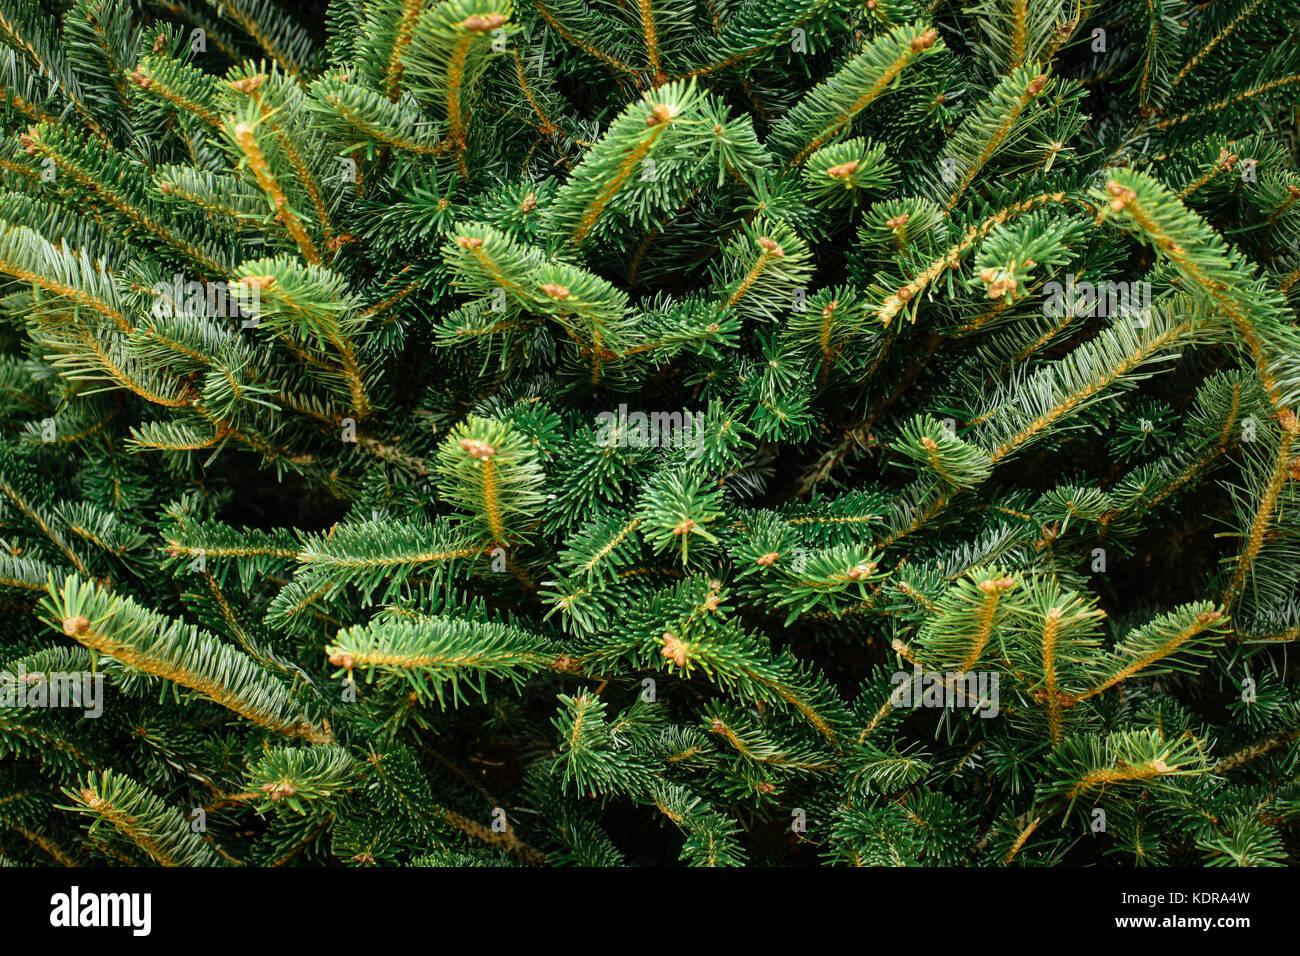 Pine Needles Christmas Stock Photos & Pine Needles